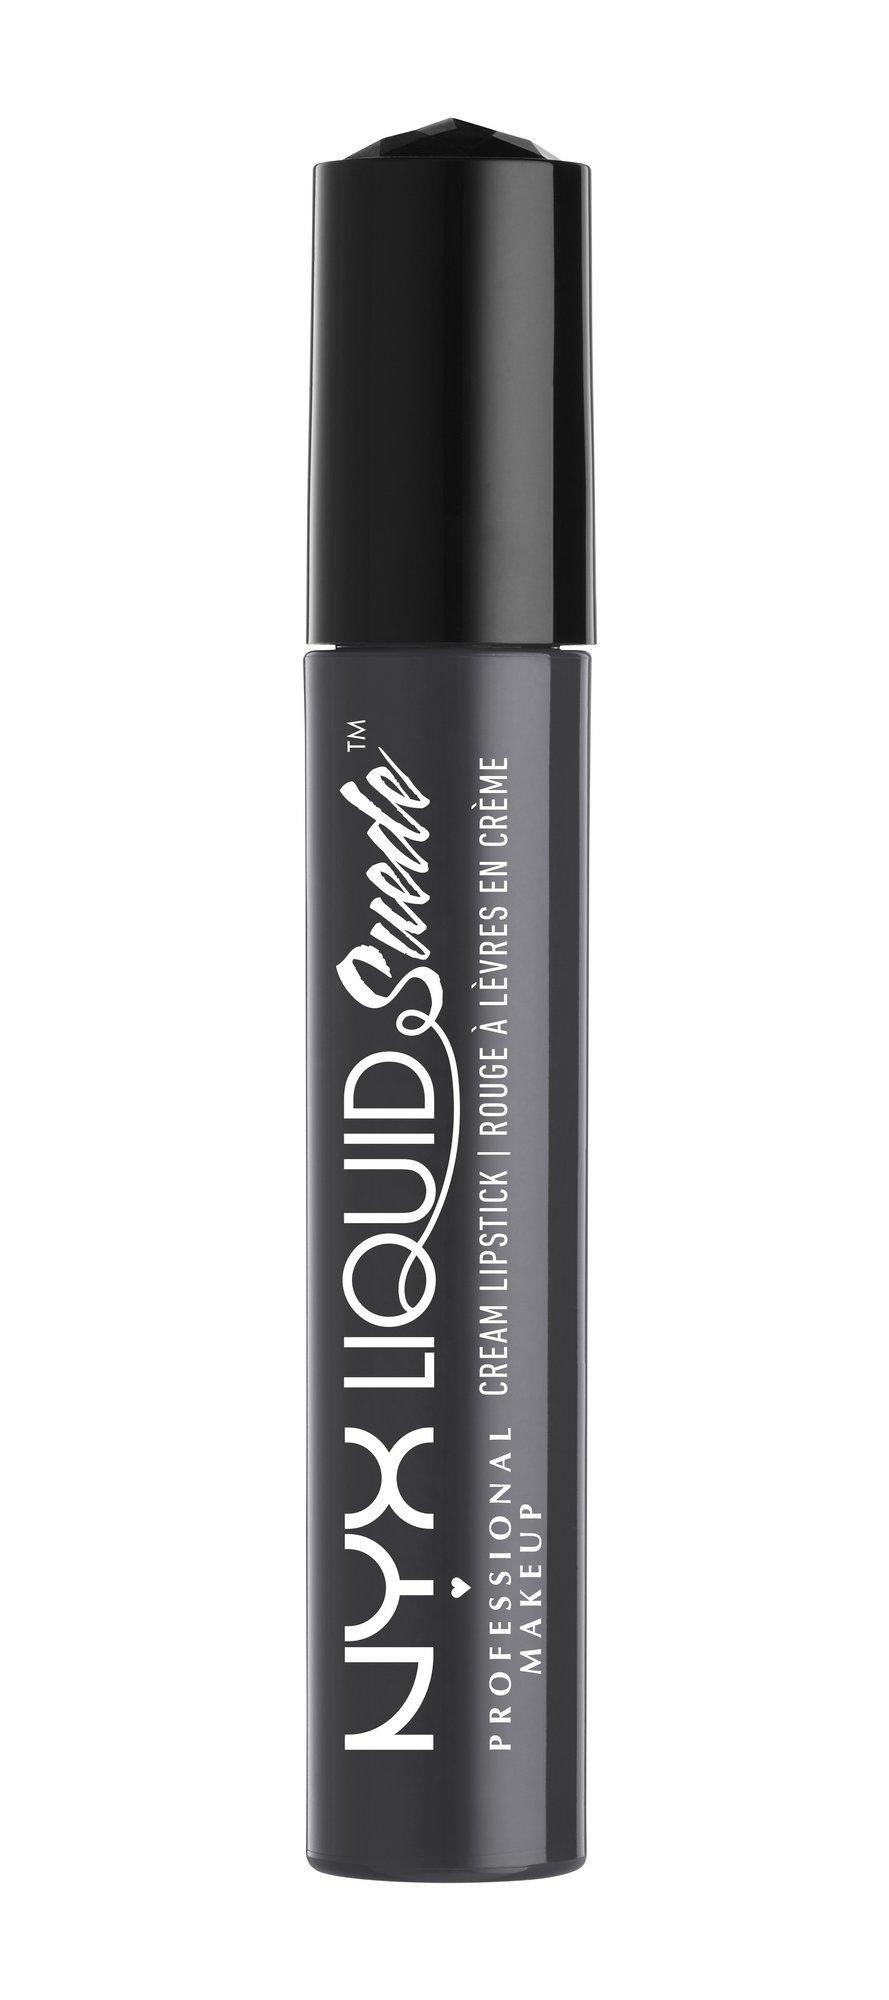 NYX Professional Makeup Liquid Suede Cream Lipstick, Stone Fox, 0.13 Fluid Ounce